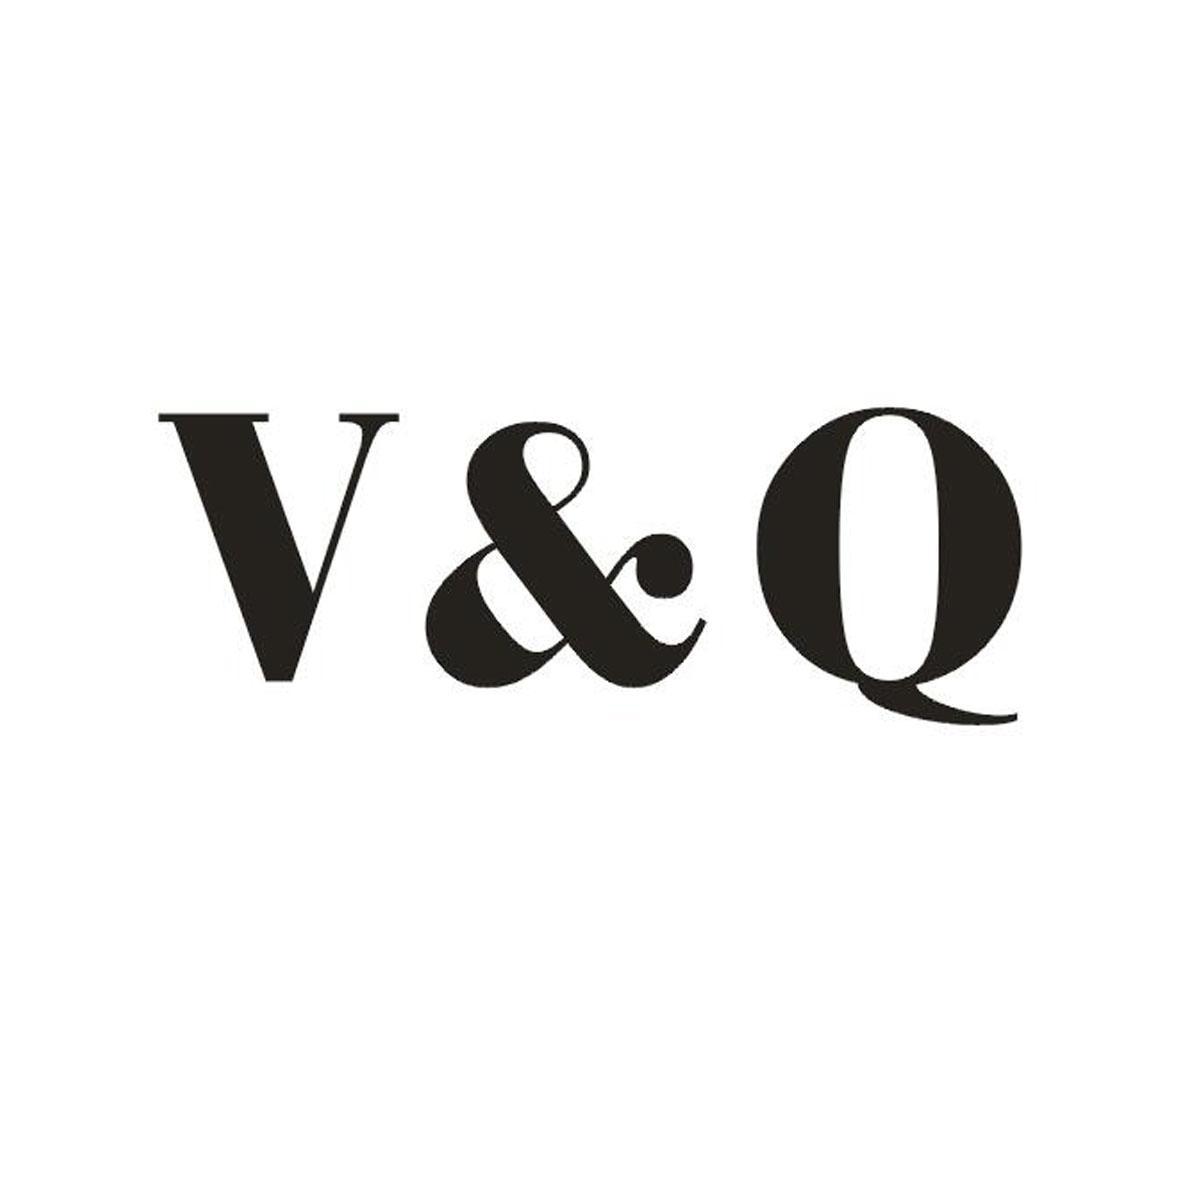 V&Q_05商标转让_05商标购买-购店网商标转让平台